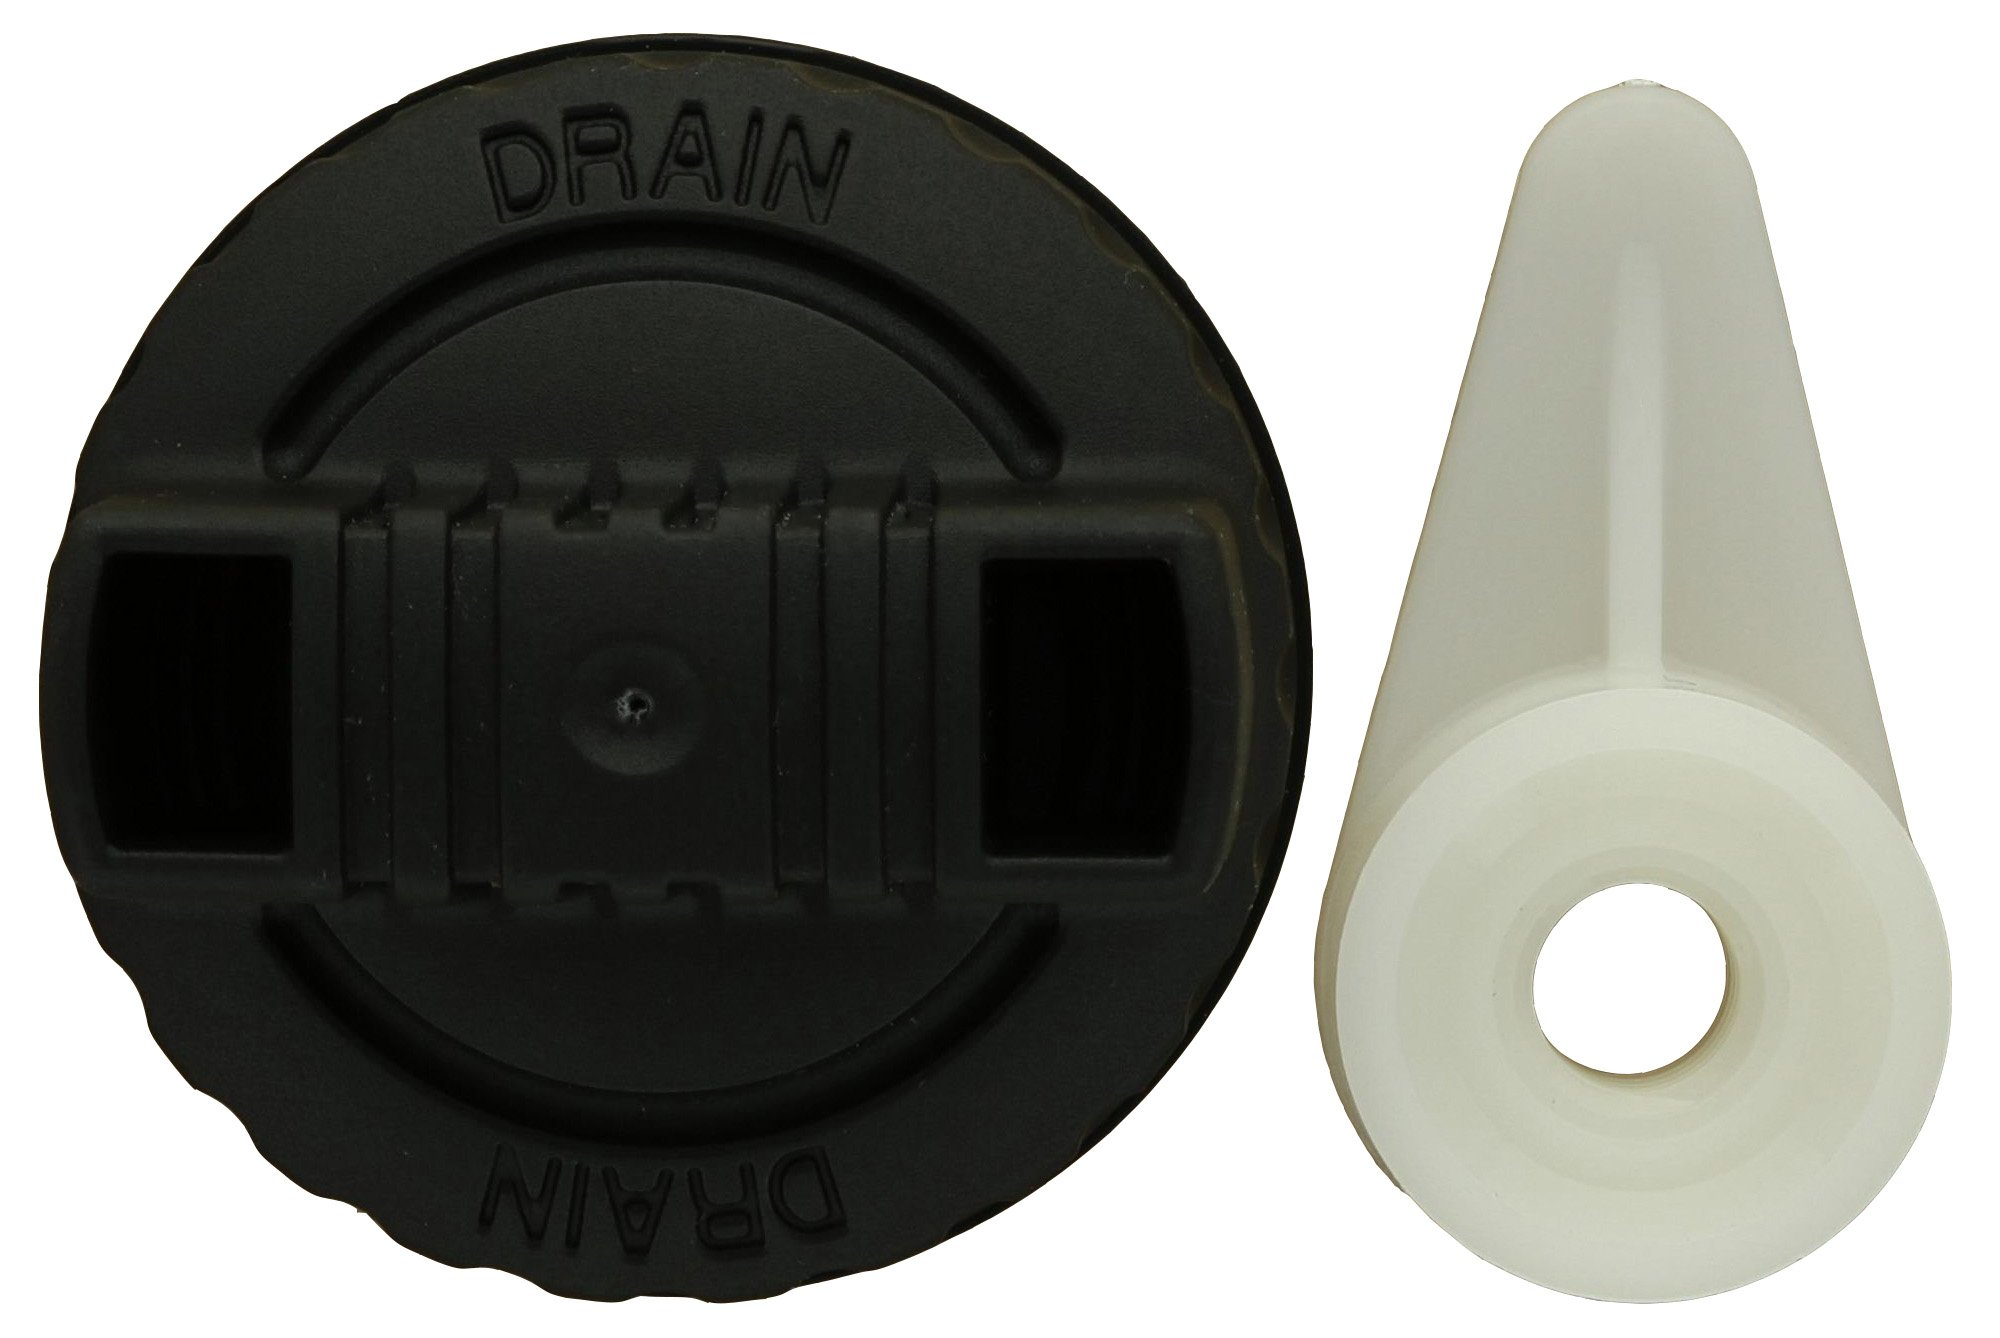 Ridgid VT2561 Genuine OEM Plastic Filter Nut and Drain Cap Kit for Pre-2010 Ridgid Wet / Dry Vacuums by Ridgid